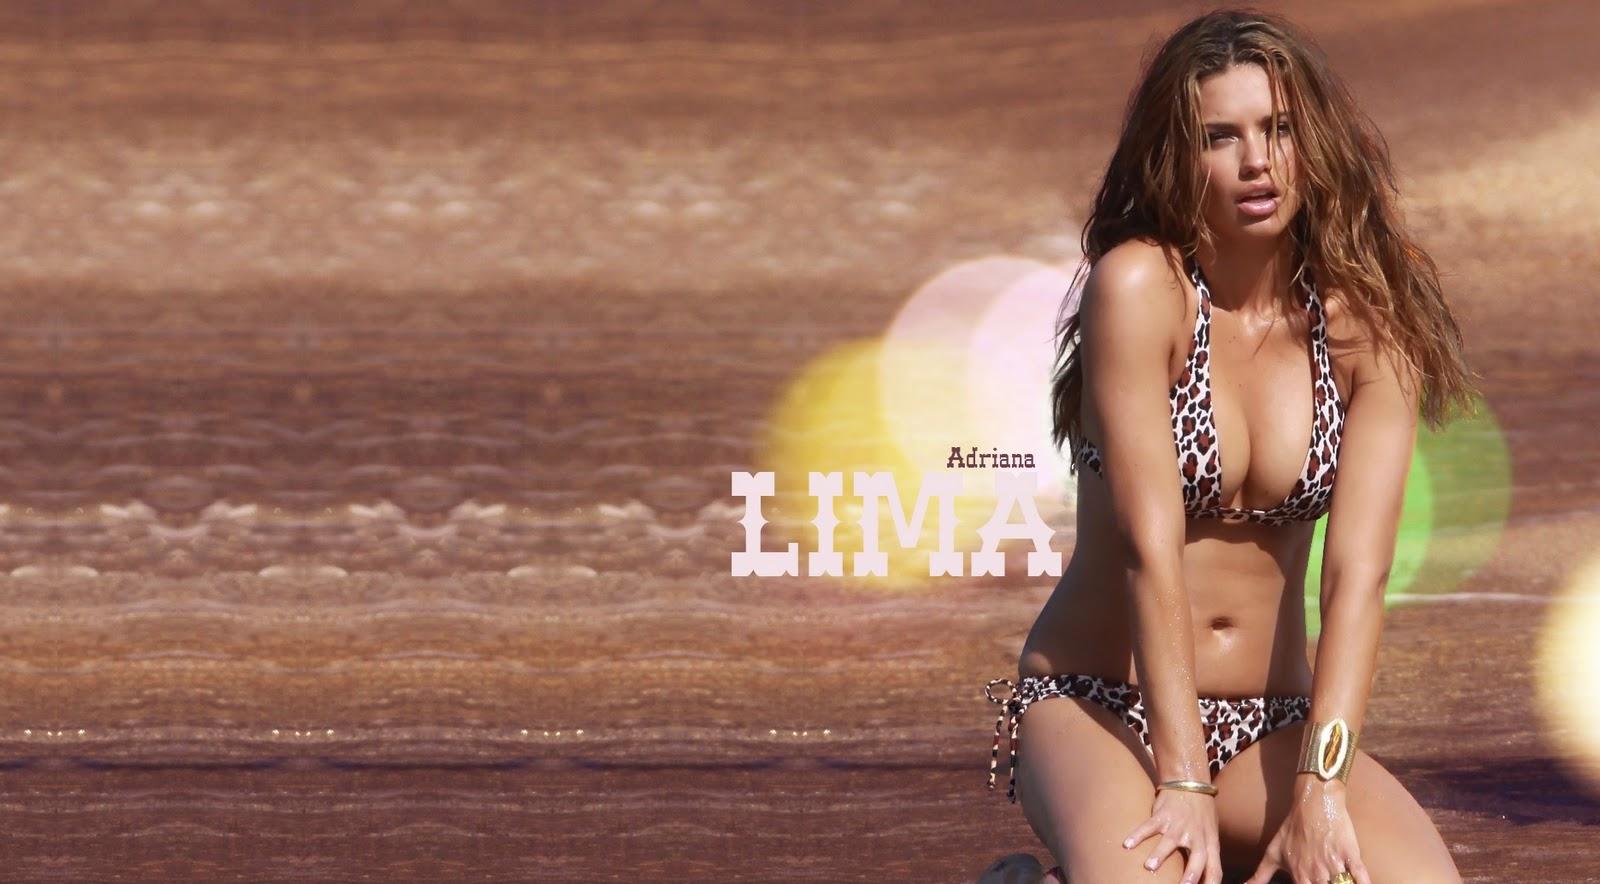 http://2.bp.blogspot.com/_SEHwRxTbjZ0/TUusPvfjdFI/AAAAAAAAC3E/mpclCtFnZ00/s1600/Adriana+Lima+%252822%2529.jpg